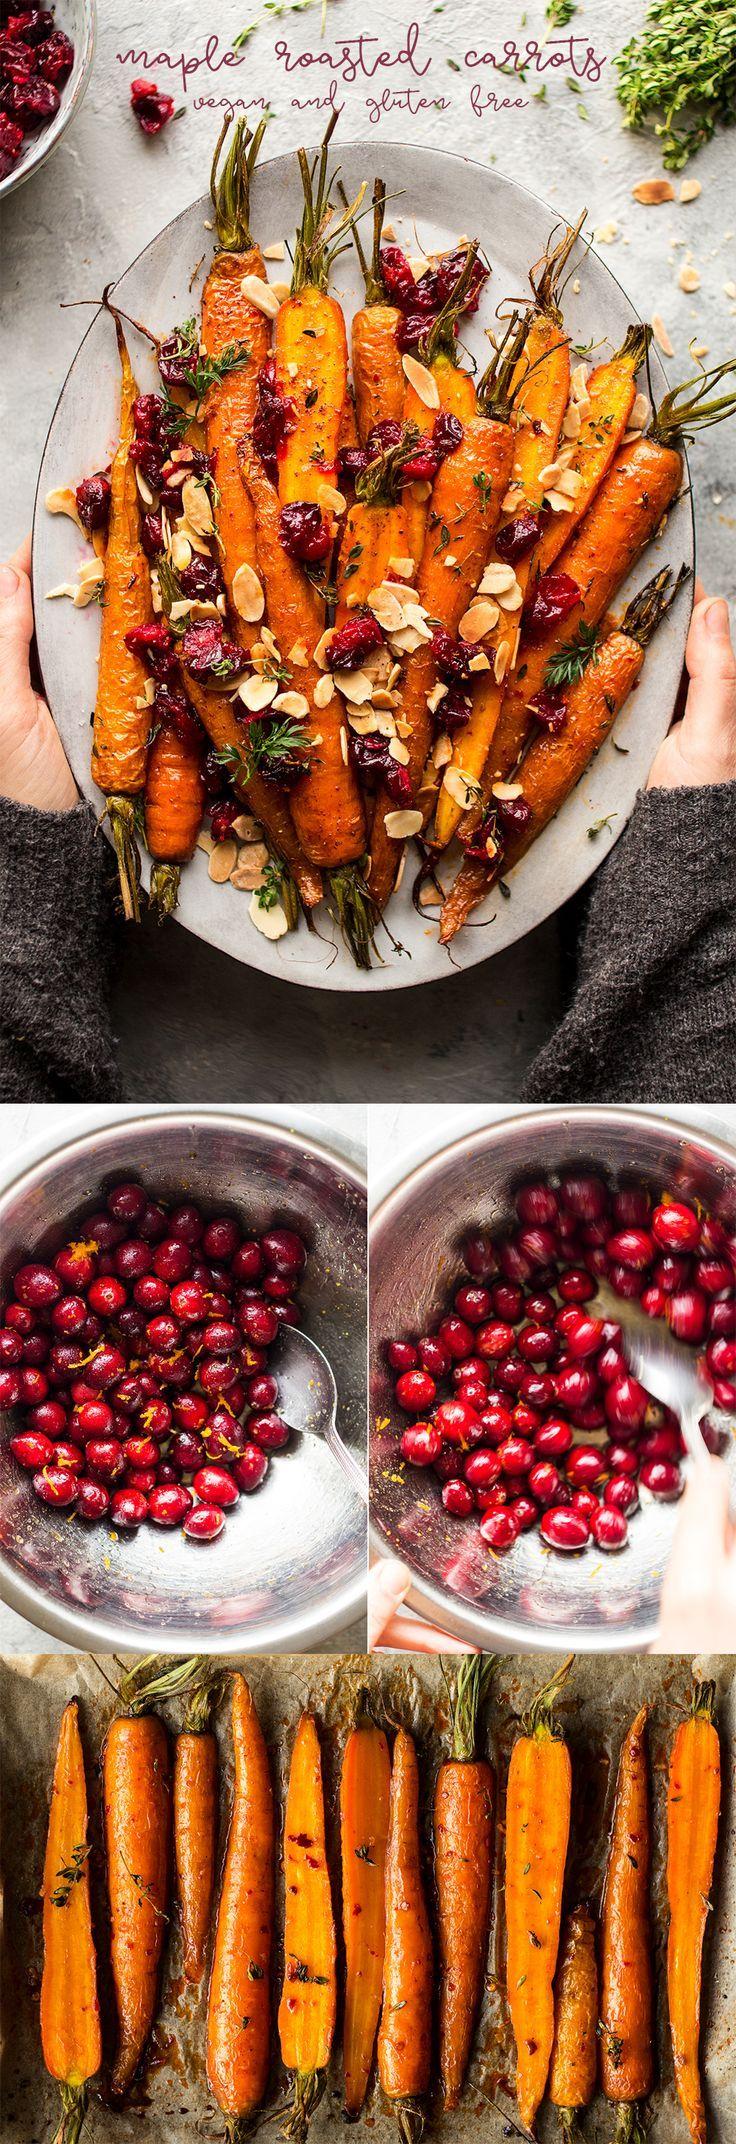 Ahorn gebratene Karotten und Preiselbeeren #fallrecipesdinner